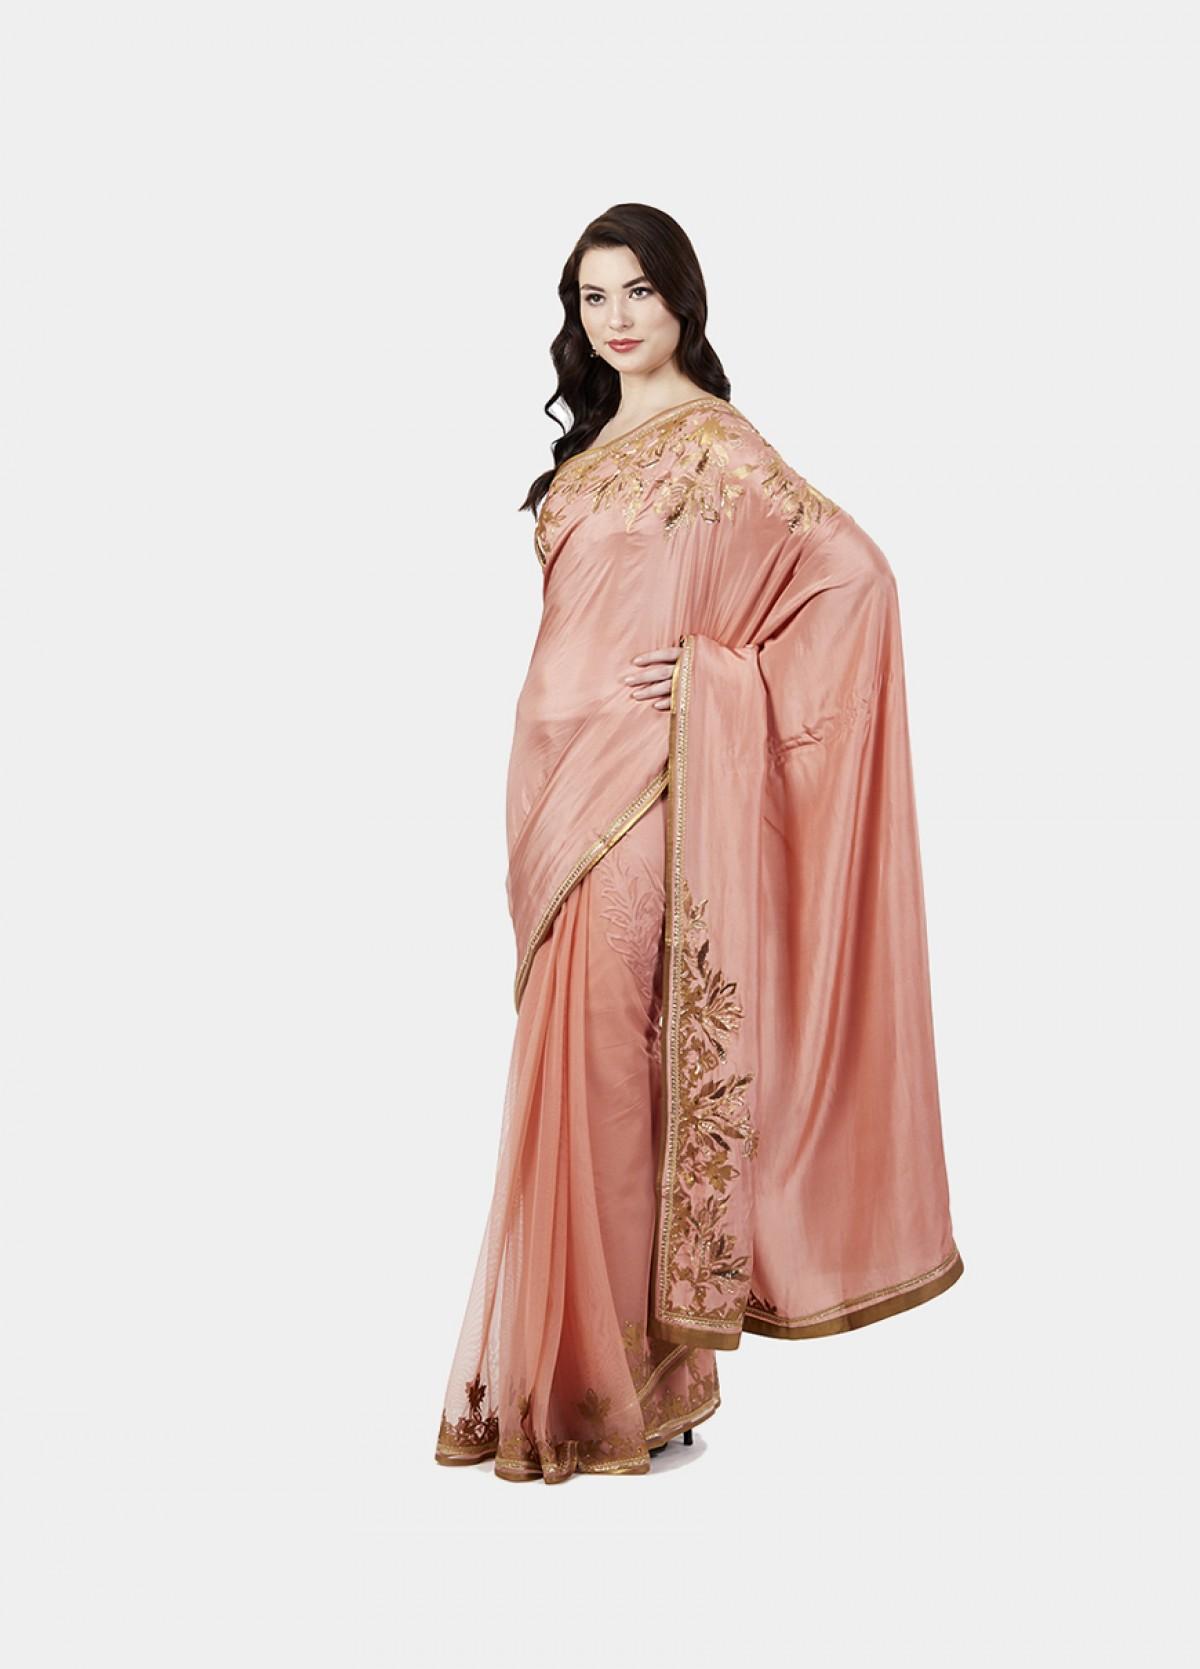 The Luxe Memories Sari